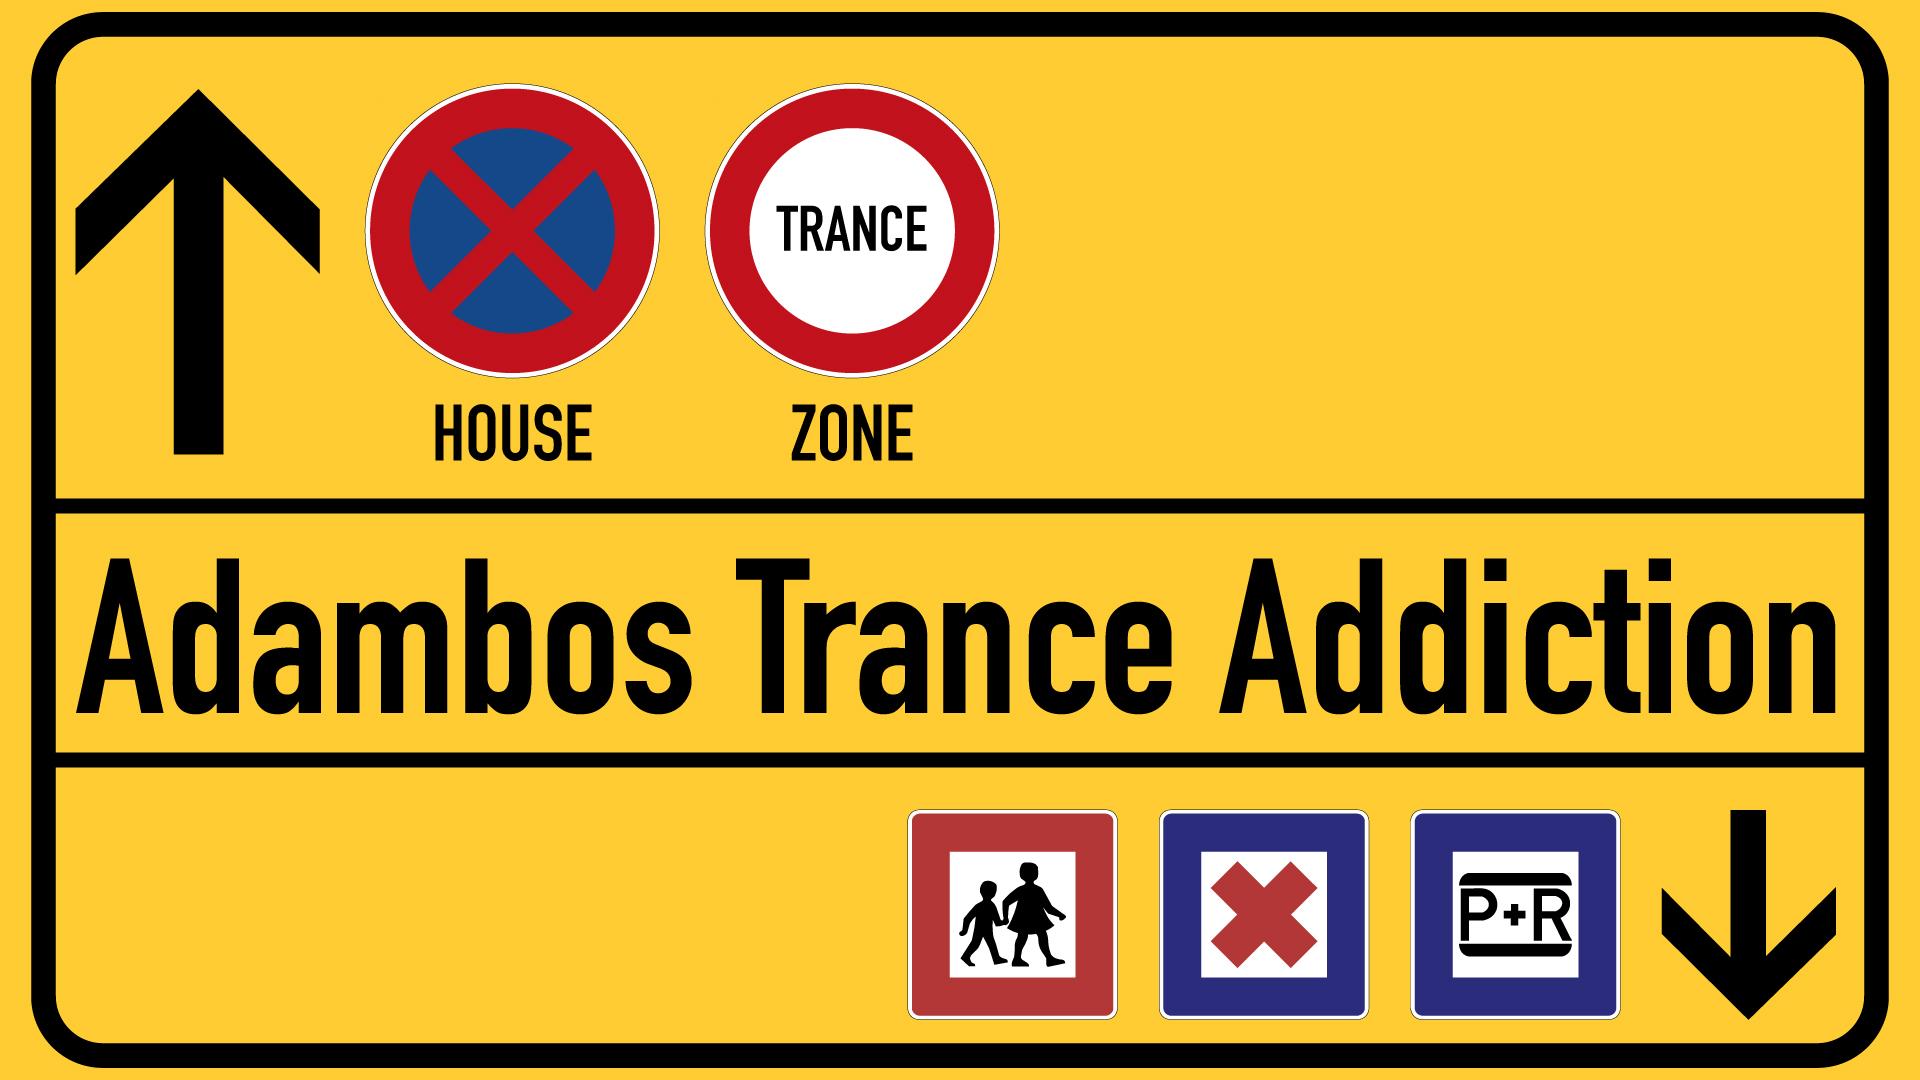 Adambos-Trance-Addiction